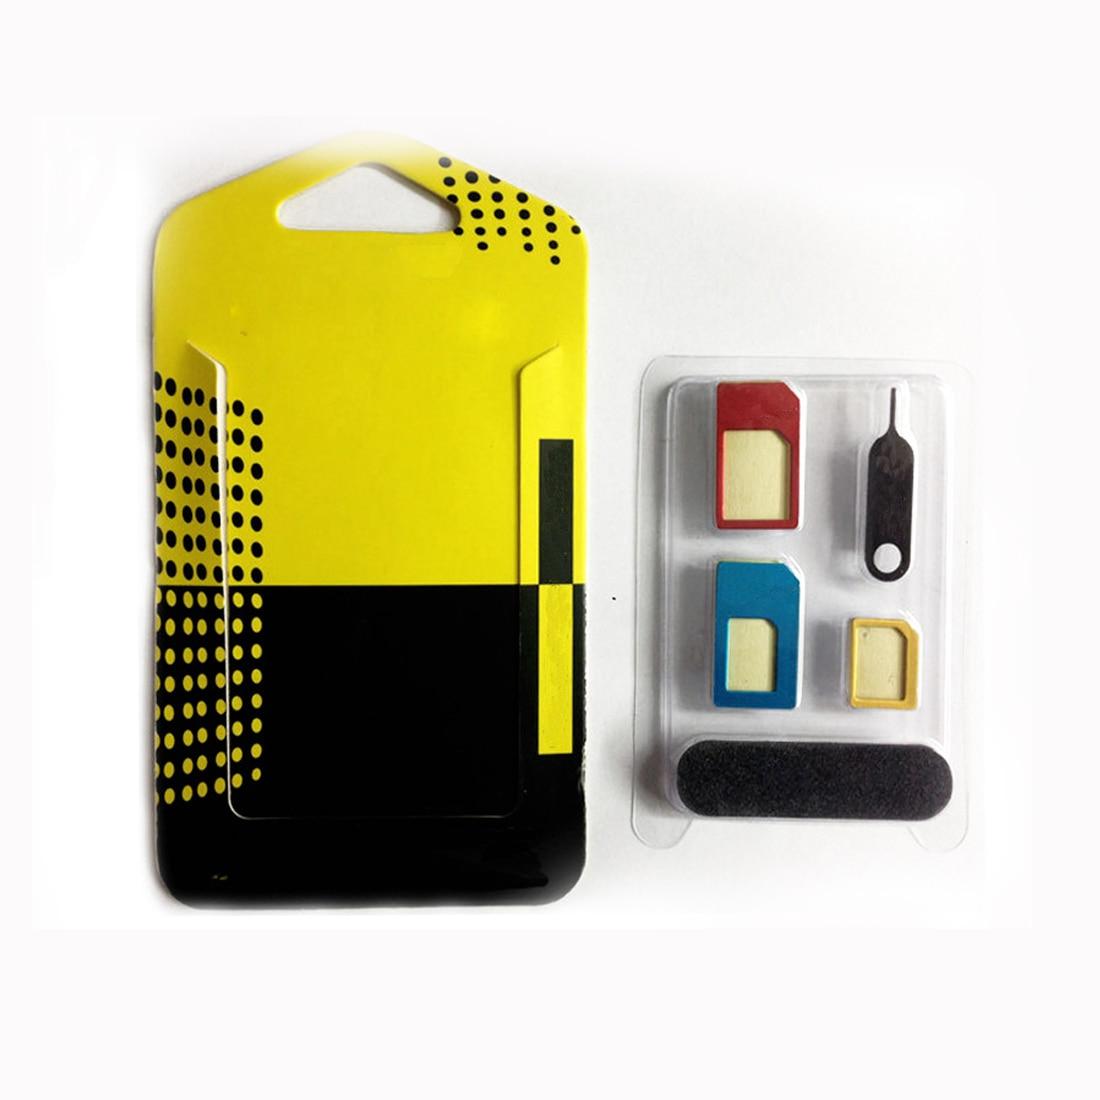 Etmakit 5 ב 1 ננו כרטיס סים מתאמים + רגיל ומייקרו Sim + תקן כרטיס ה-SIM & 5S 4S כלים עבור iPhone 4 5 5c 6 6 s תיבה הקמעונאי